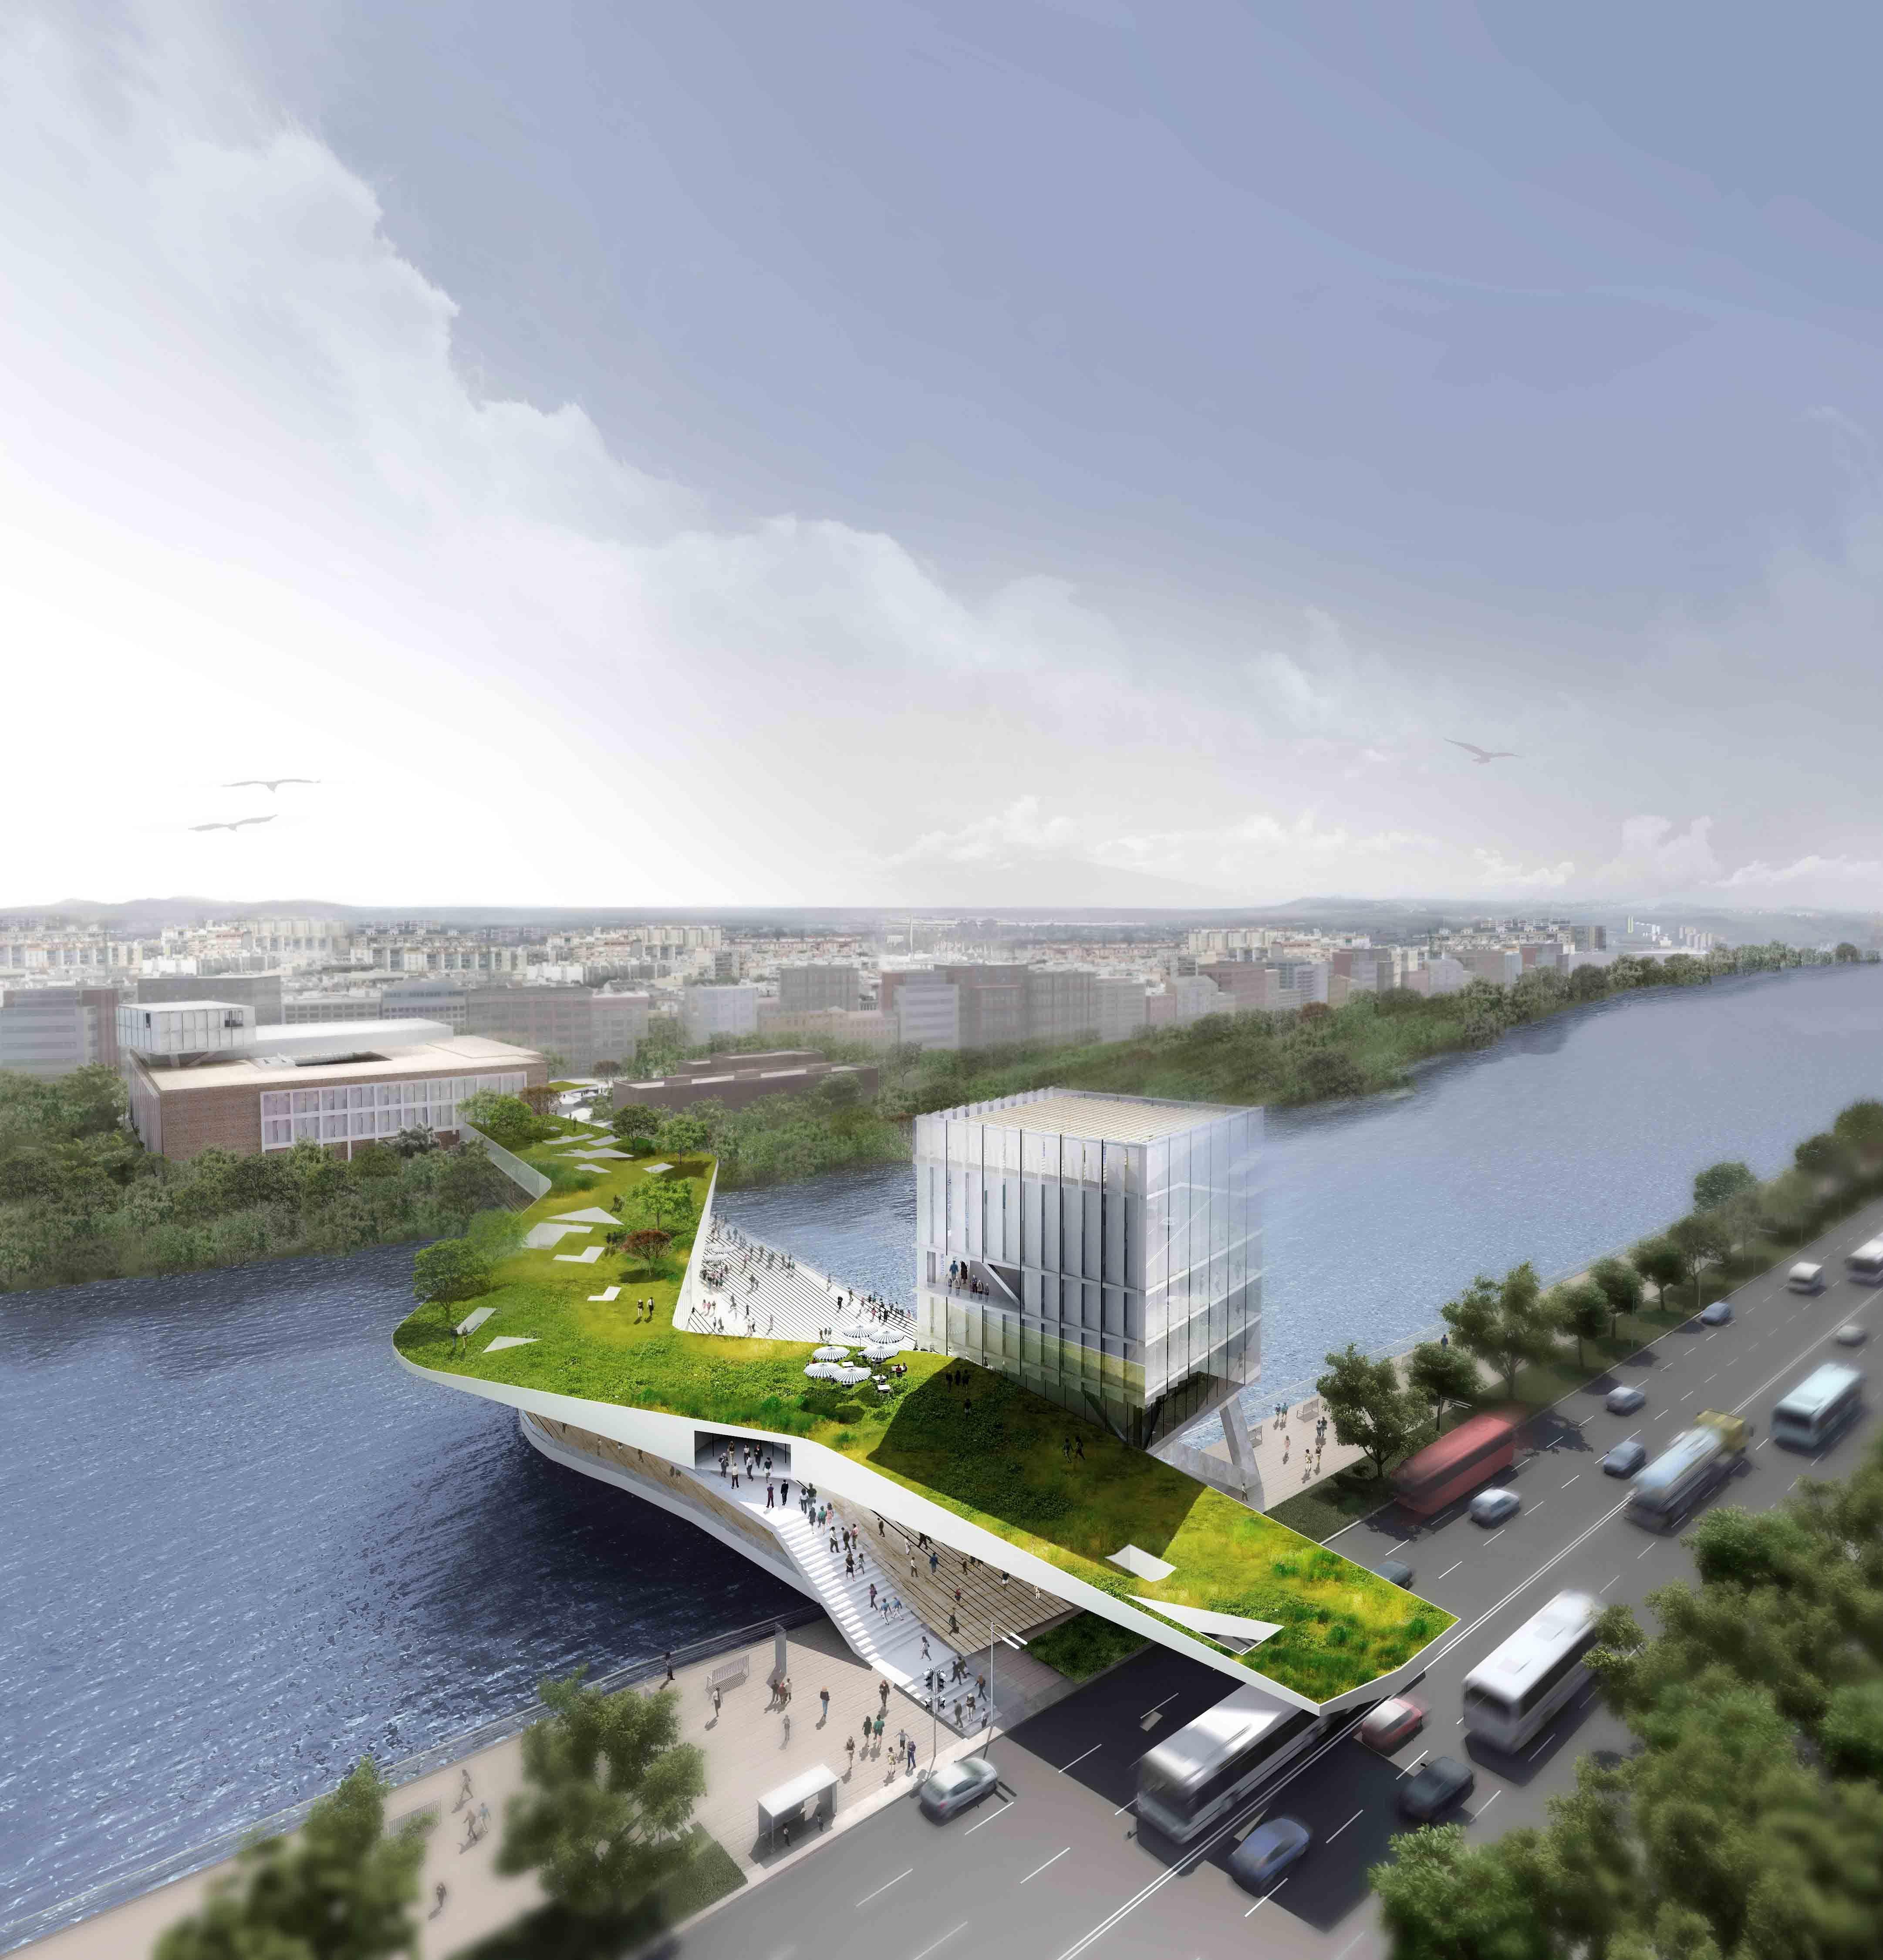 Kentsel ye il alan peyzaj farkli peyzaj pinterest architektur st dtebau ve wohnungsbau - Beruhmte architektur ...